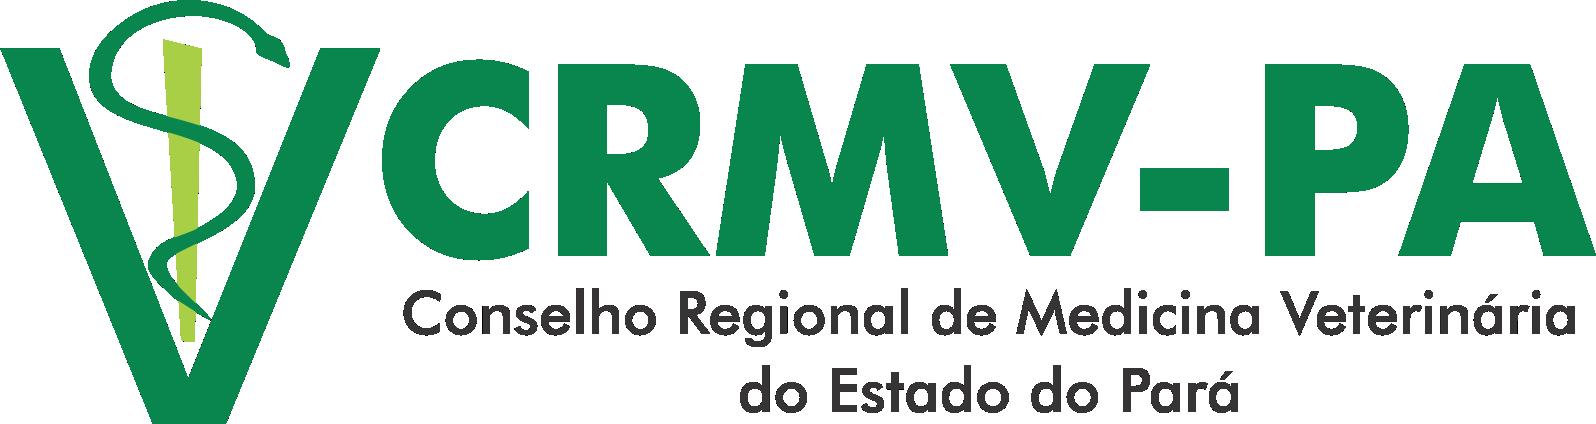 Logotipo do CRMV-PA